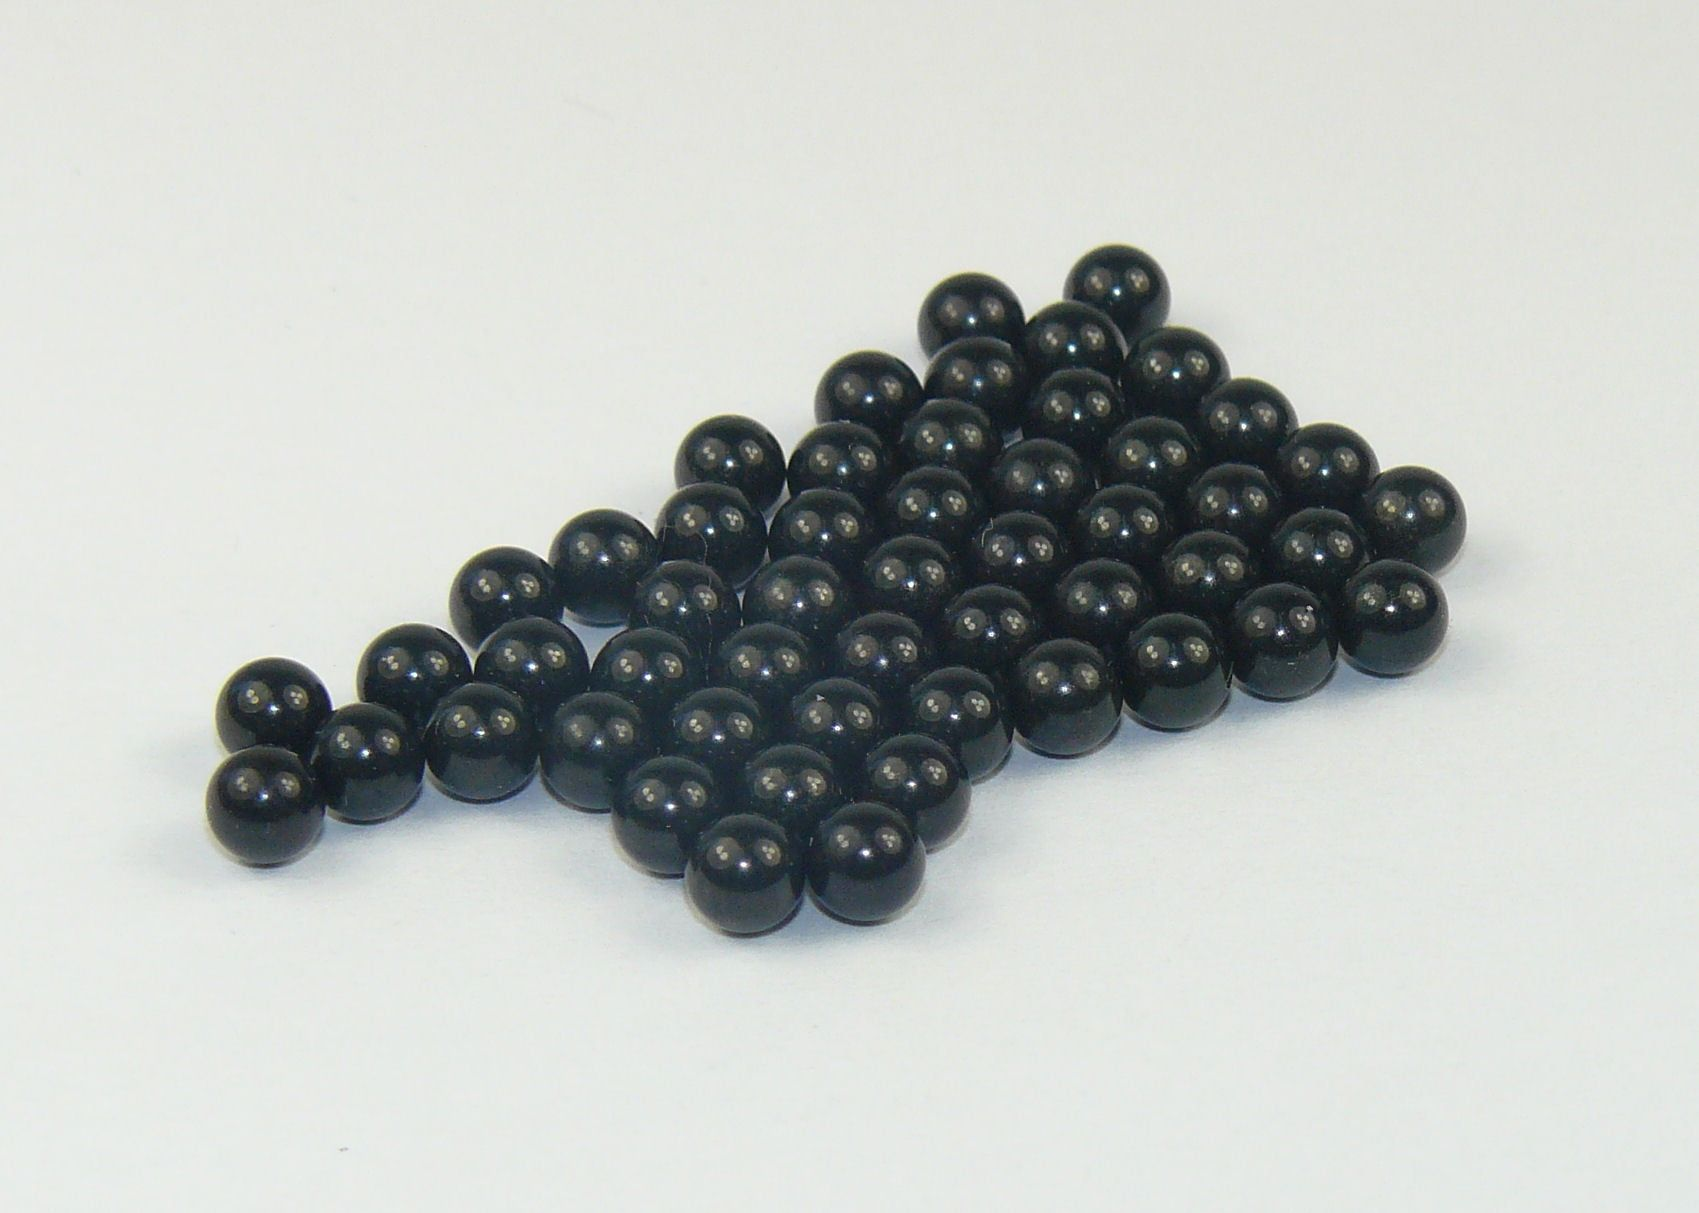 Caldercraft Black Steel Cannon Balls Pack of 50